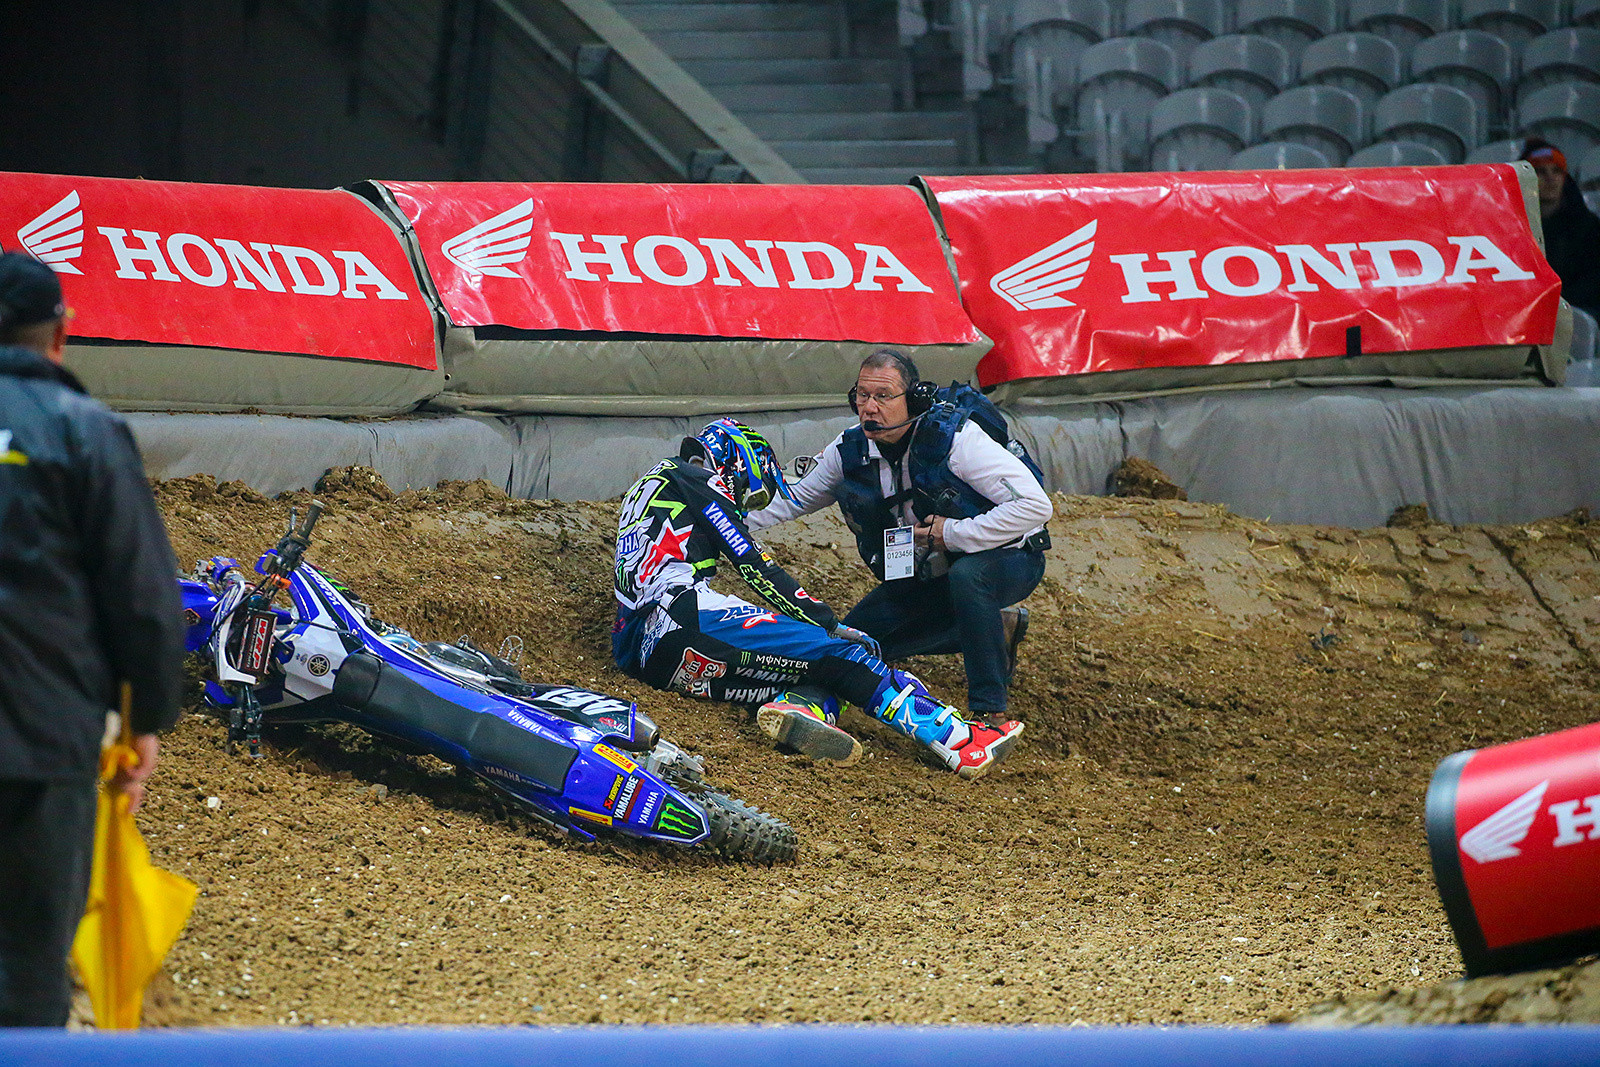 Romain Febvre - Photo Gallery: Saturday at the Paris-Lille Supercross - Motocross Pictures - Vital MX